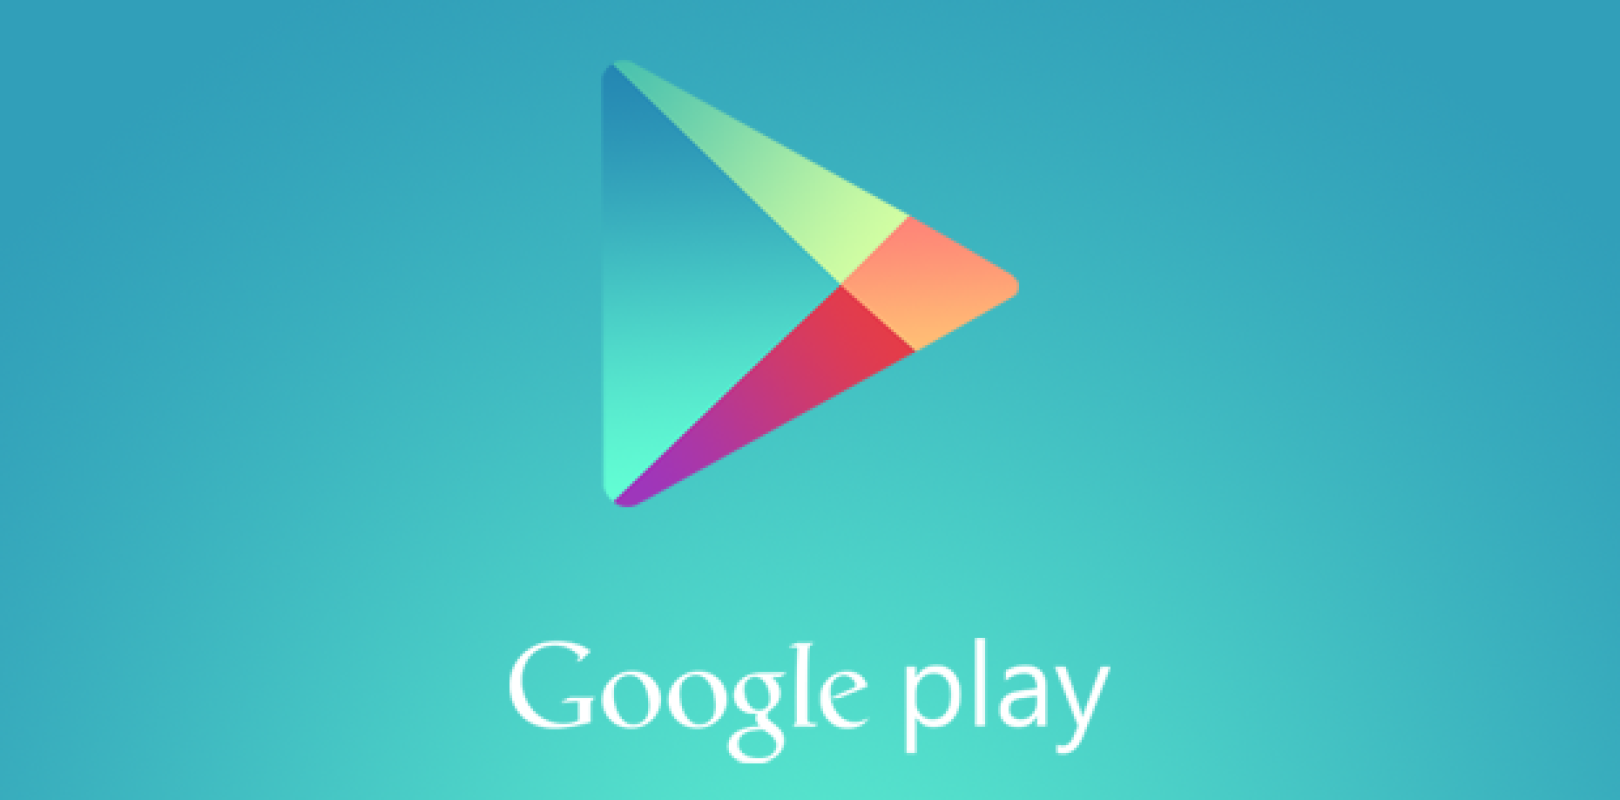 Google Play出台新规 强制所有手游以及广告进行分级